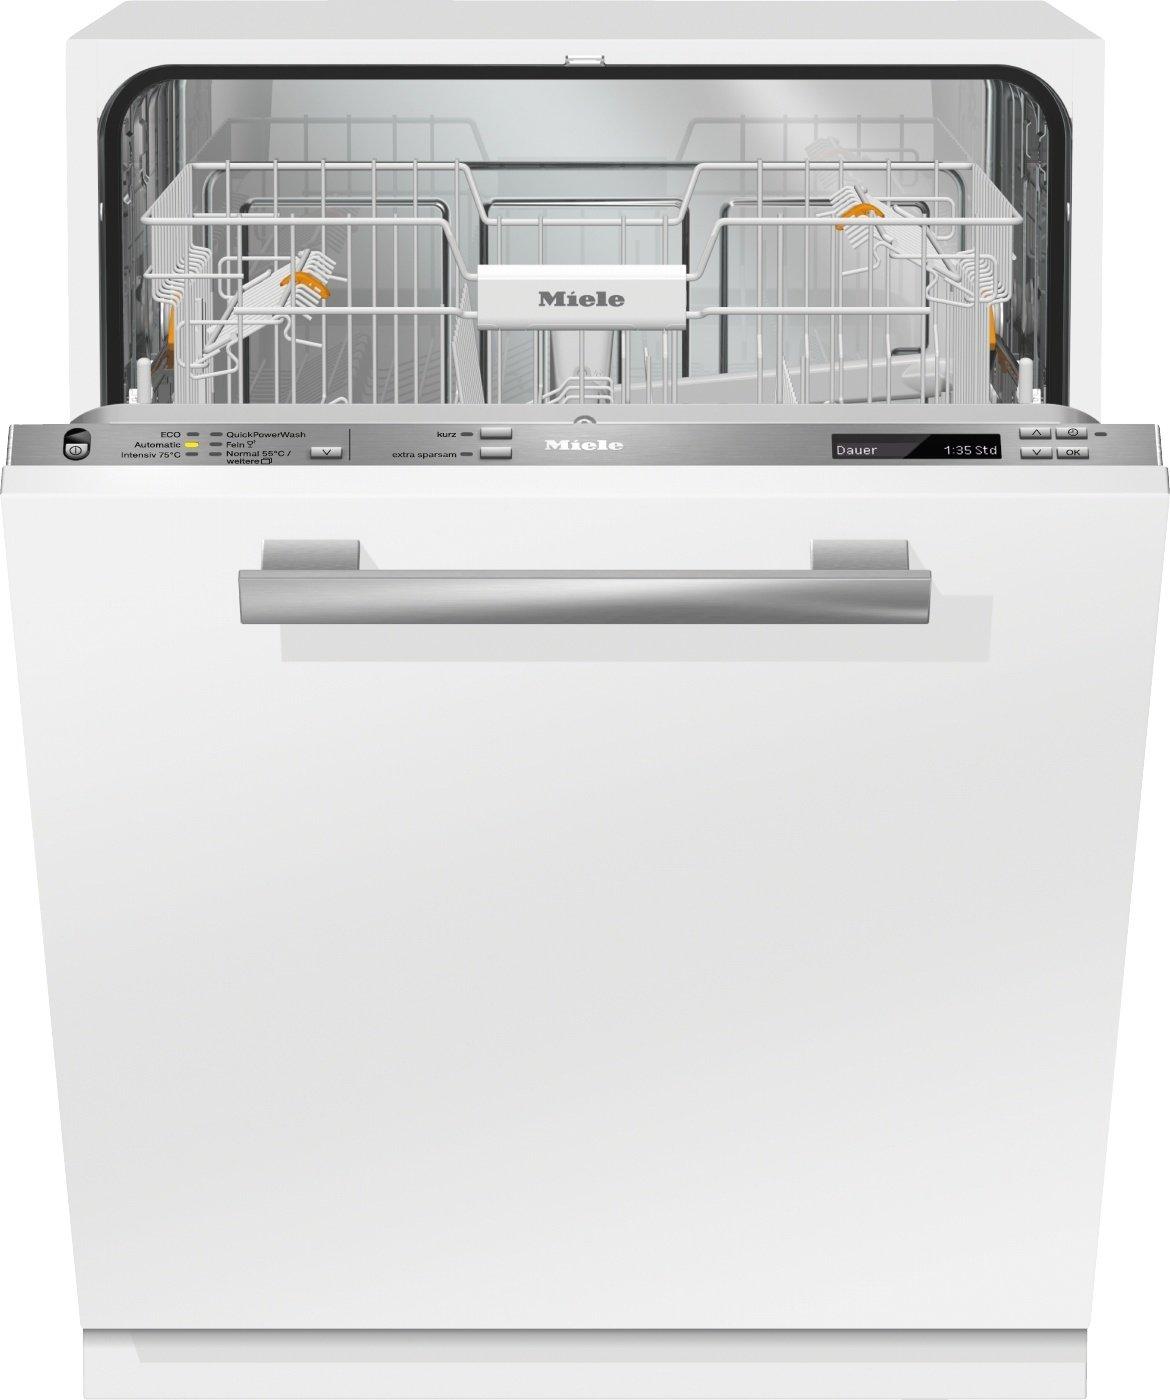 Miele G6770 Vi Geschirrspüler Vollintegriert / A+++ / 210 kWh / 13 MGD / QuickPowerWash / Alles restlos trocken AutoOpen-Trocknung